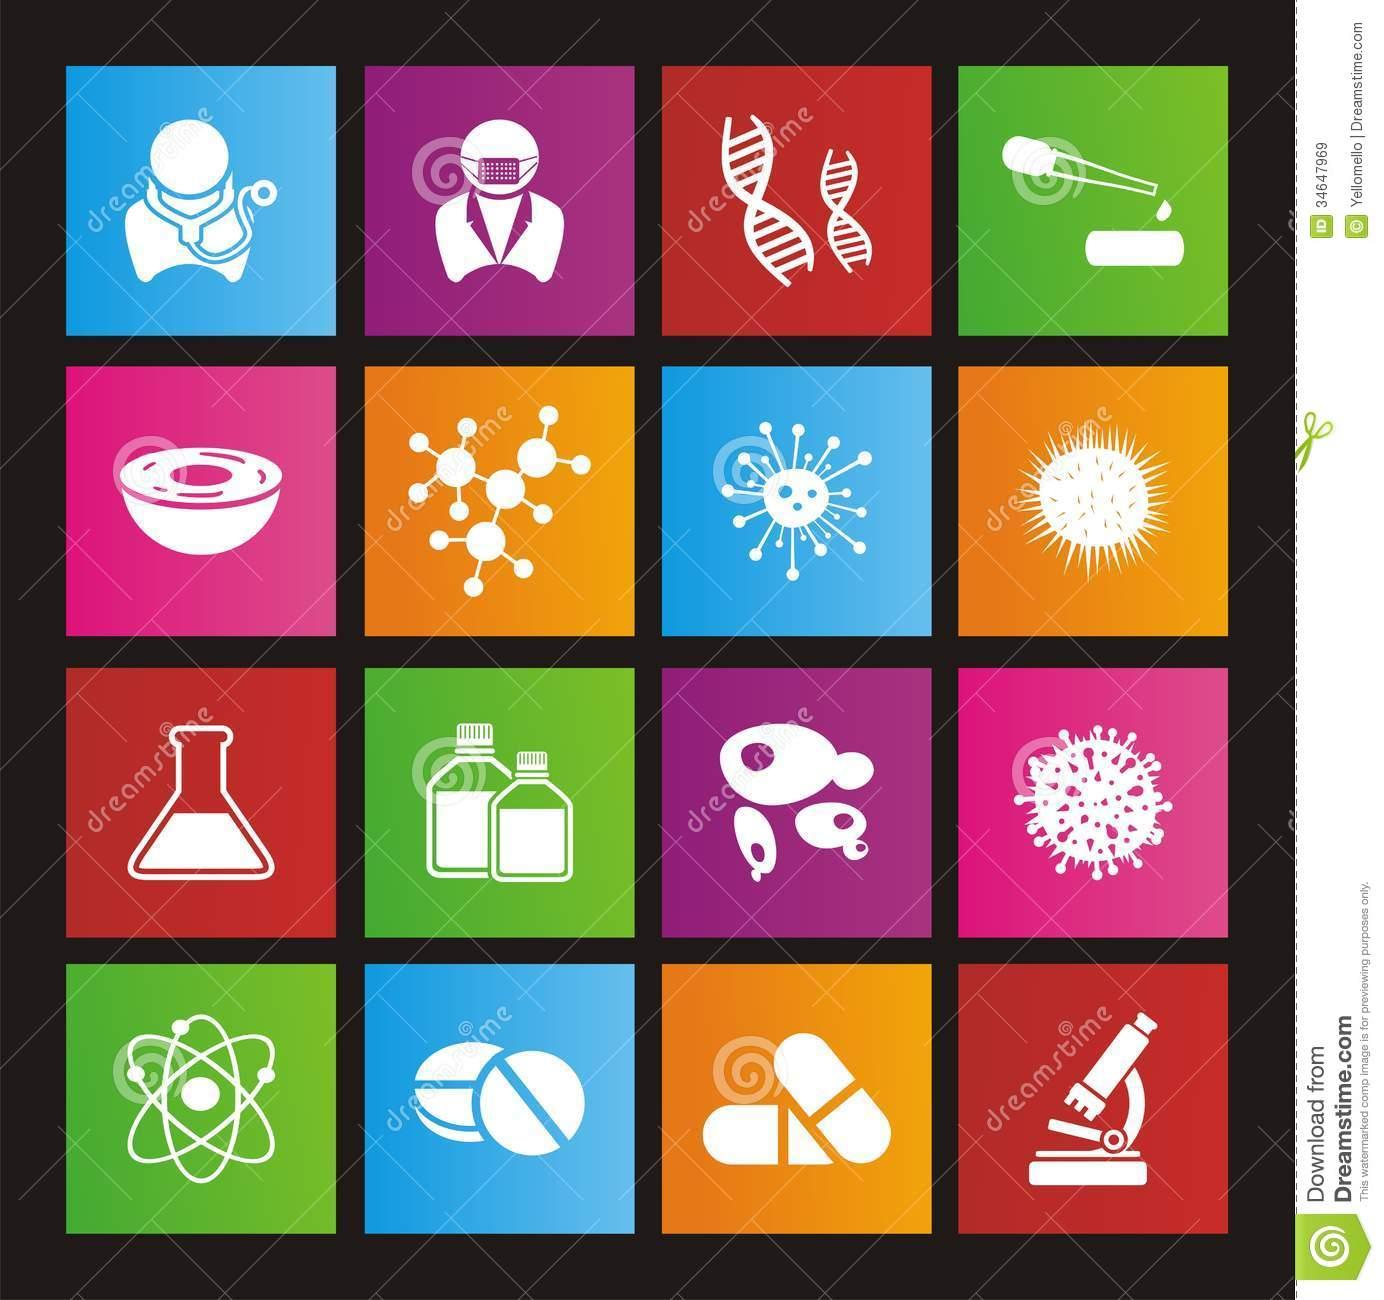 Biotechnology Flat Style Icon Sets Royalty Free Stock Photo.